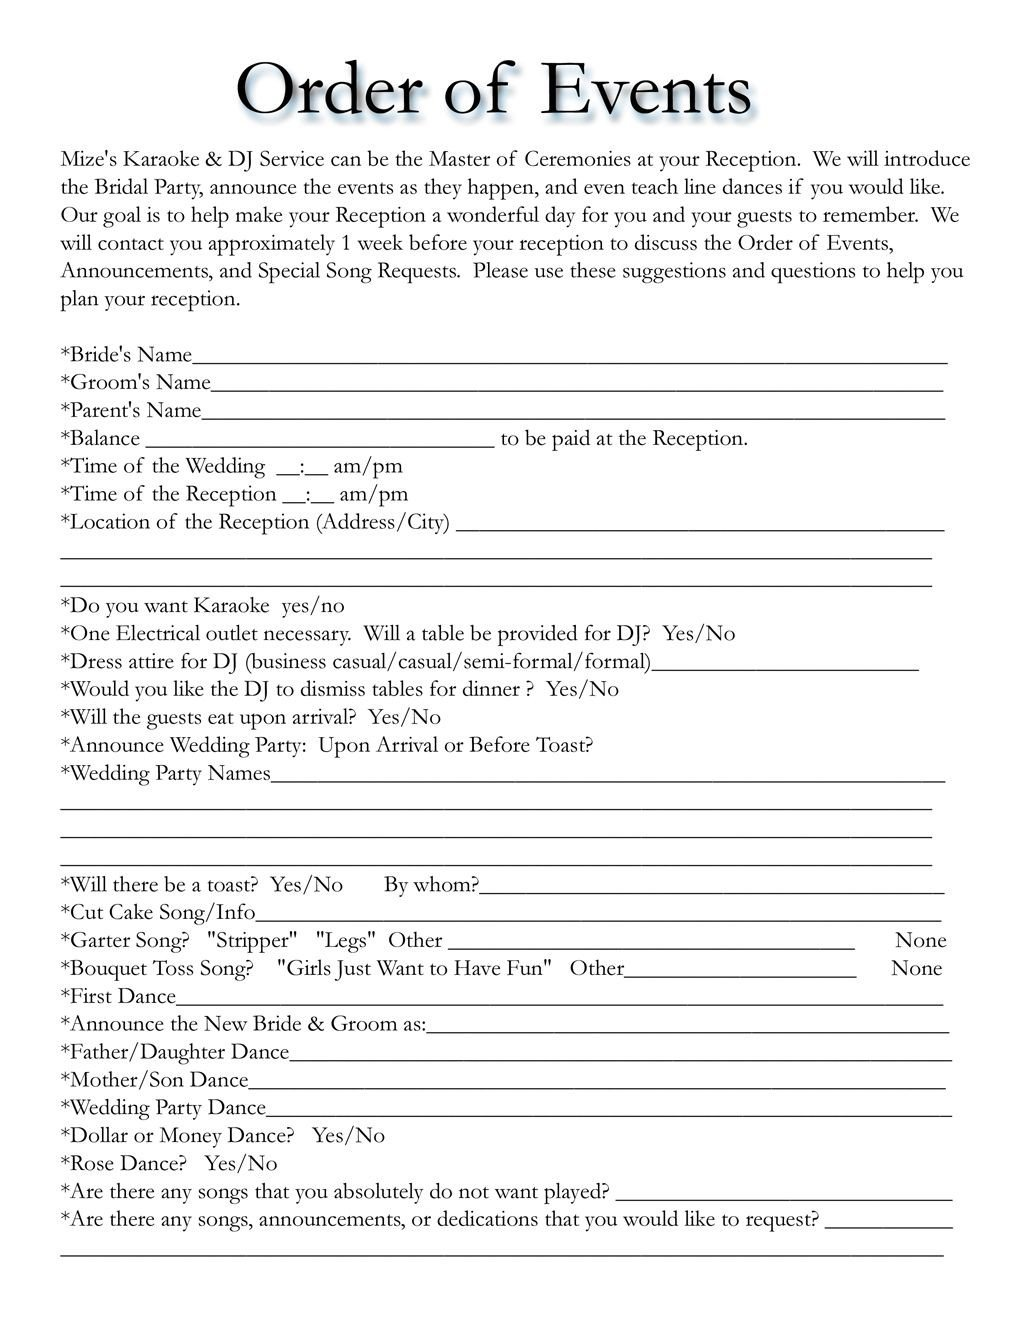 Free Wedding Itinerary Template Wedding Itinerary Templates Free